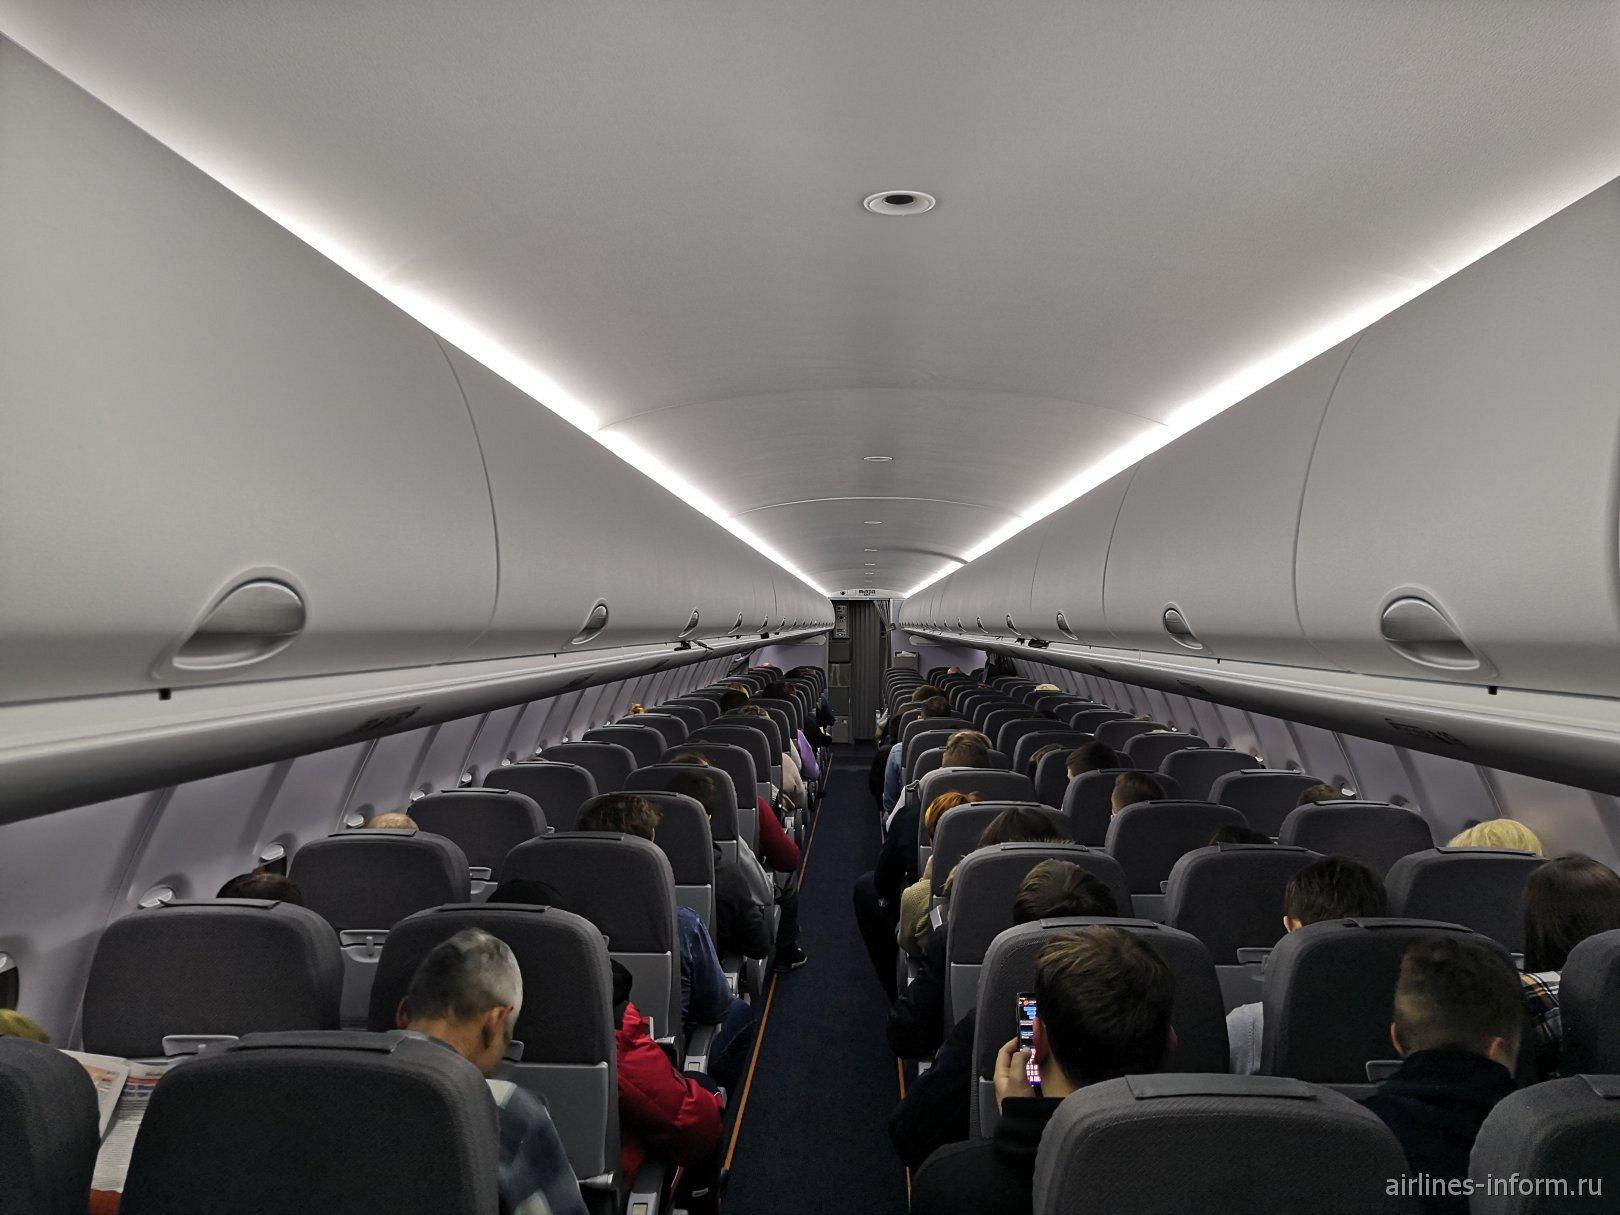 Пассажирский салон самолета Сухой Суперджет-100 авиакомпании Азимут